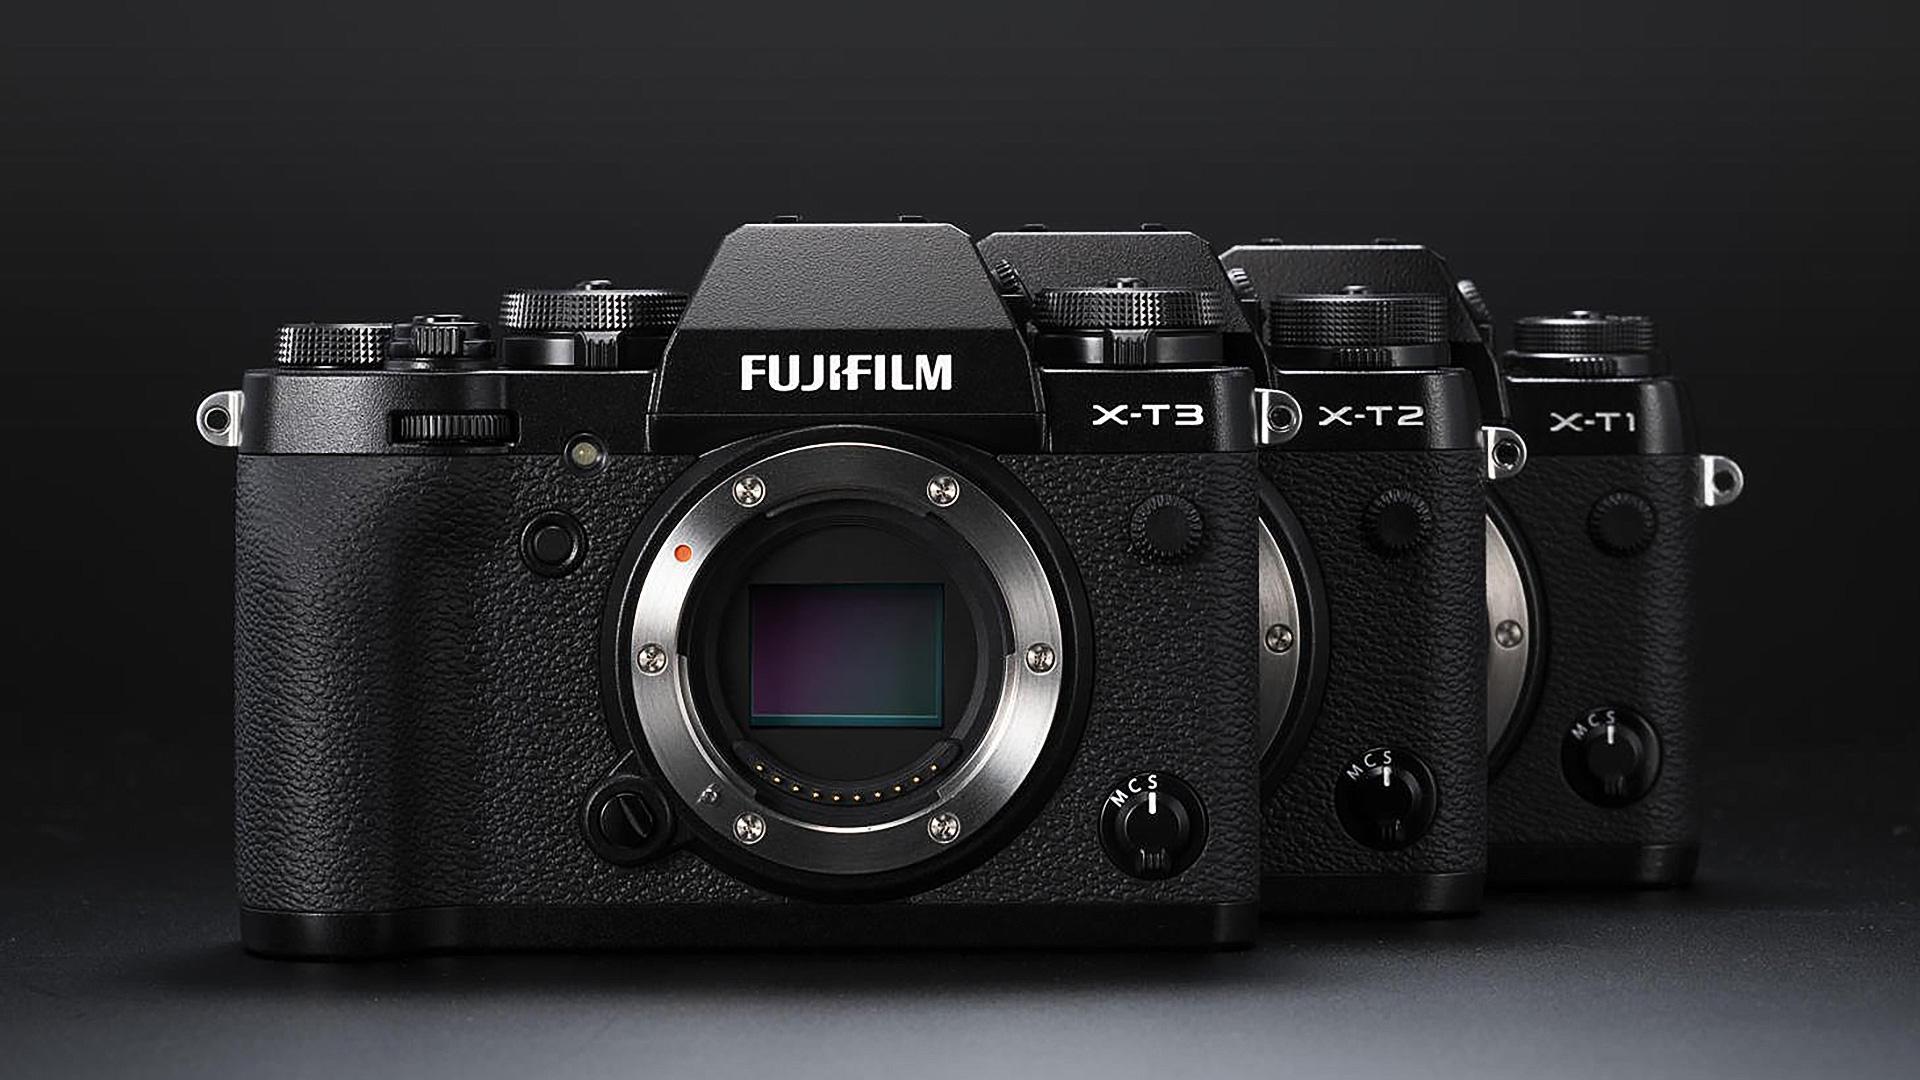 Fuji Hs 35 Manual Ebook Fujifilm Mirrorless Camera X T20 1650 Bk Array U2013 Untitled Rh Creativityinnovationsuccess Wordpress Com